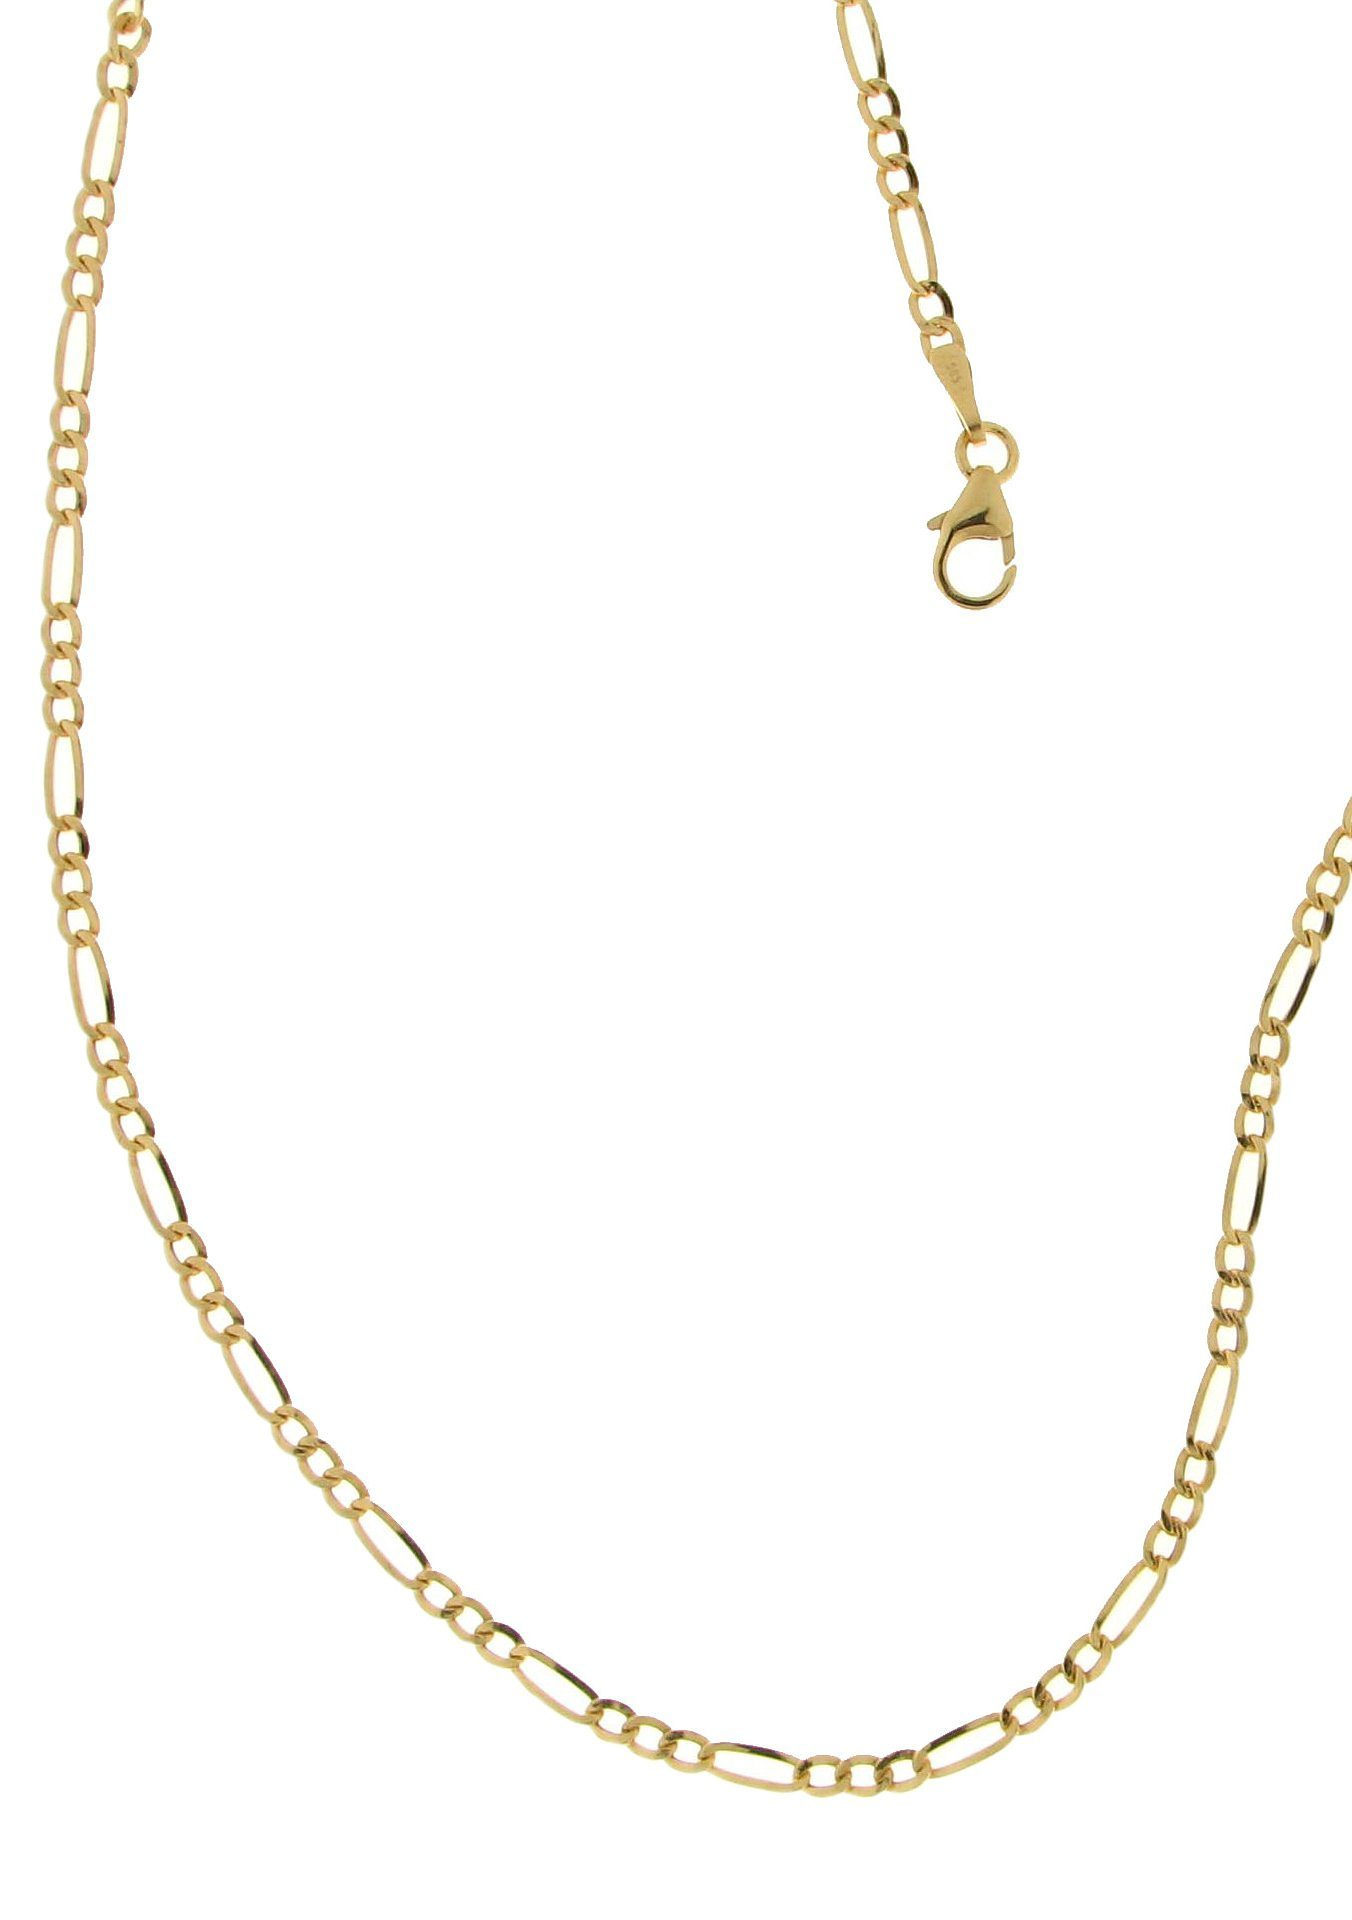 Firetti Goldkette »in Figarokettengliederung, 2-fach diamantiert, poliert«